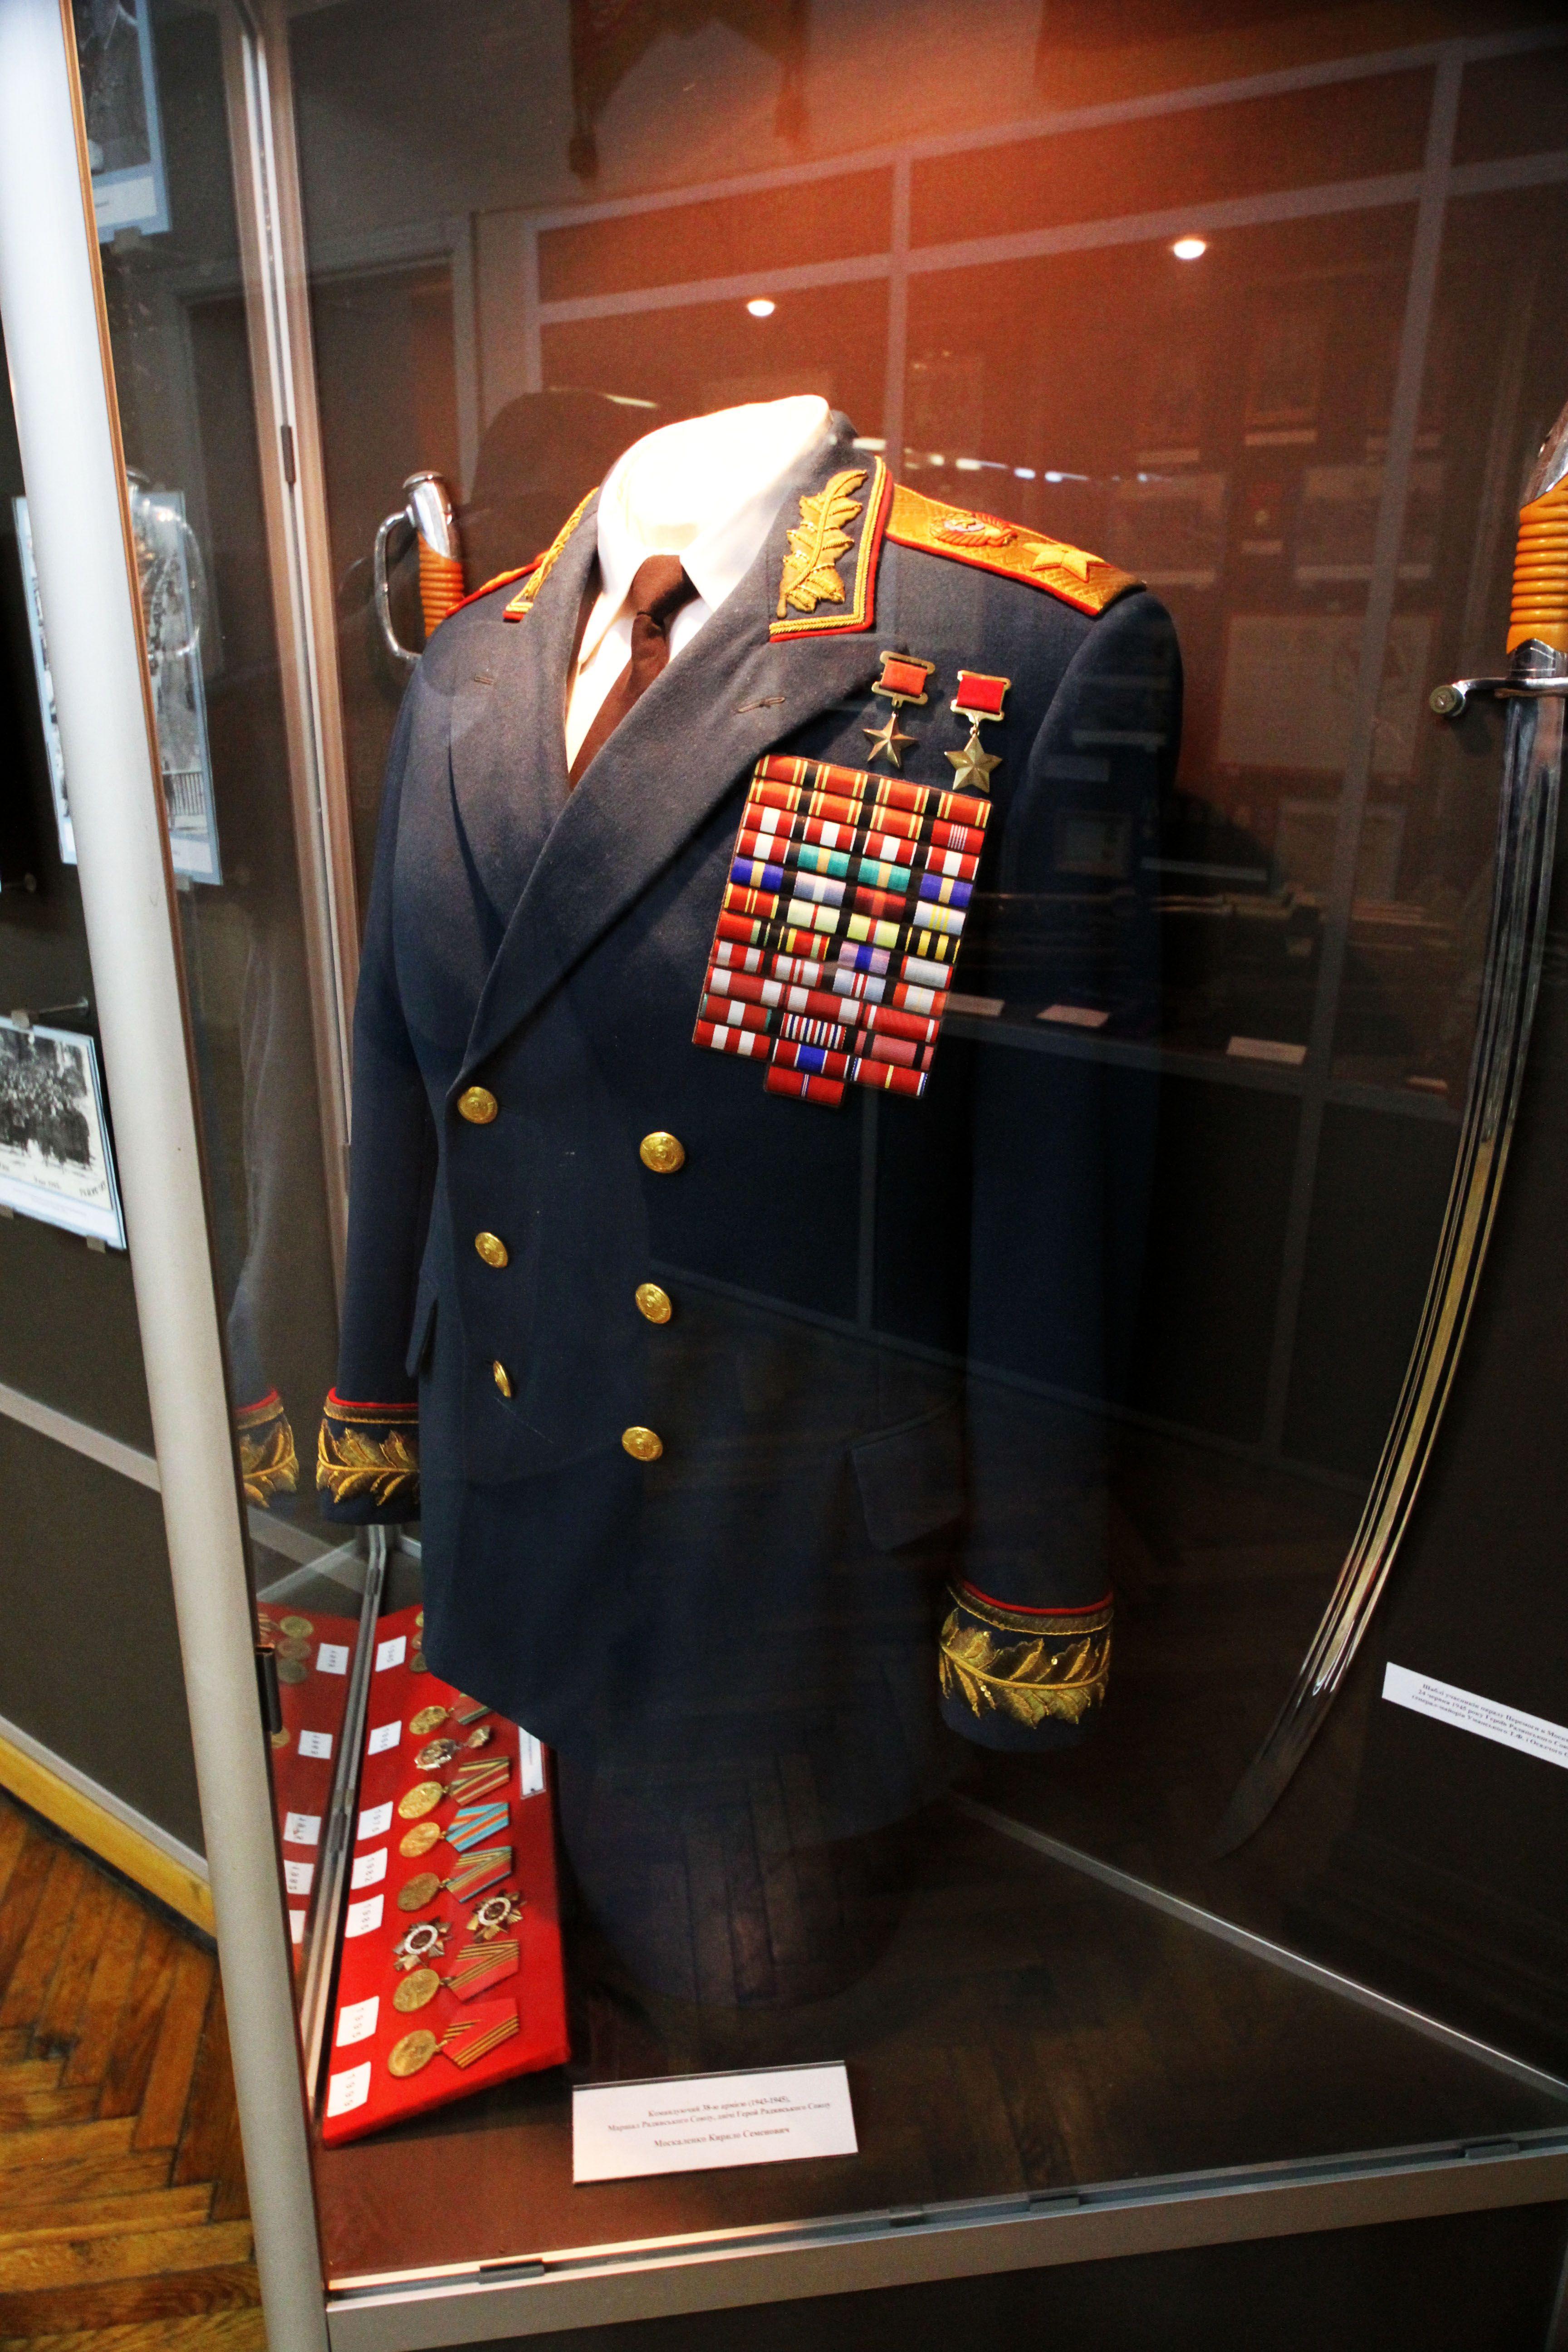 Tunic of Kirill Semenovich Moskalenko